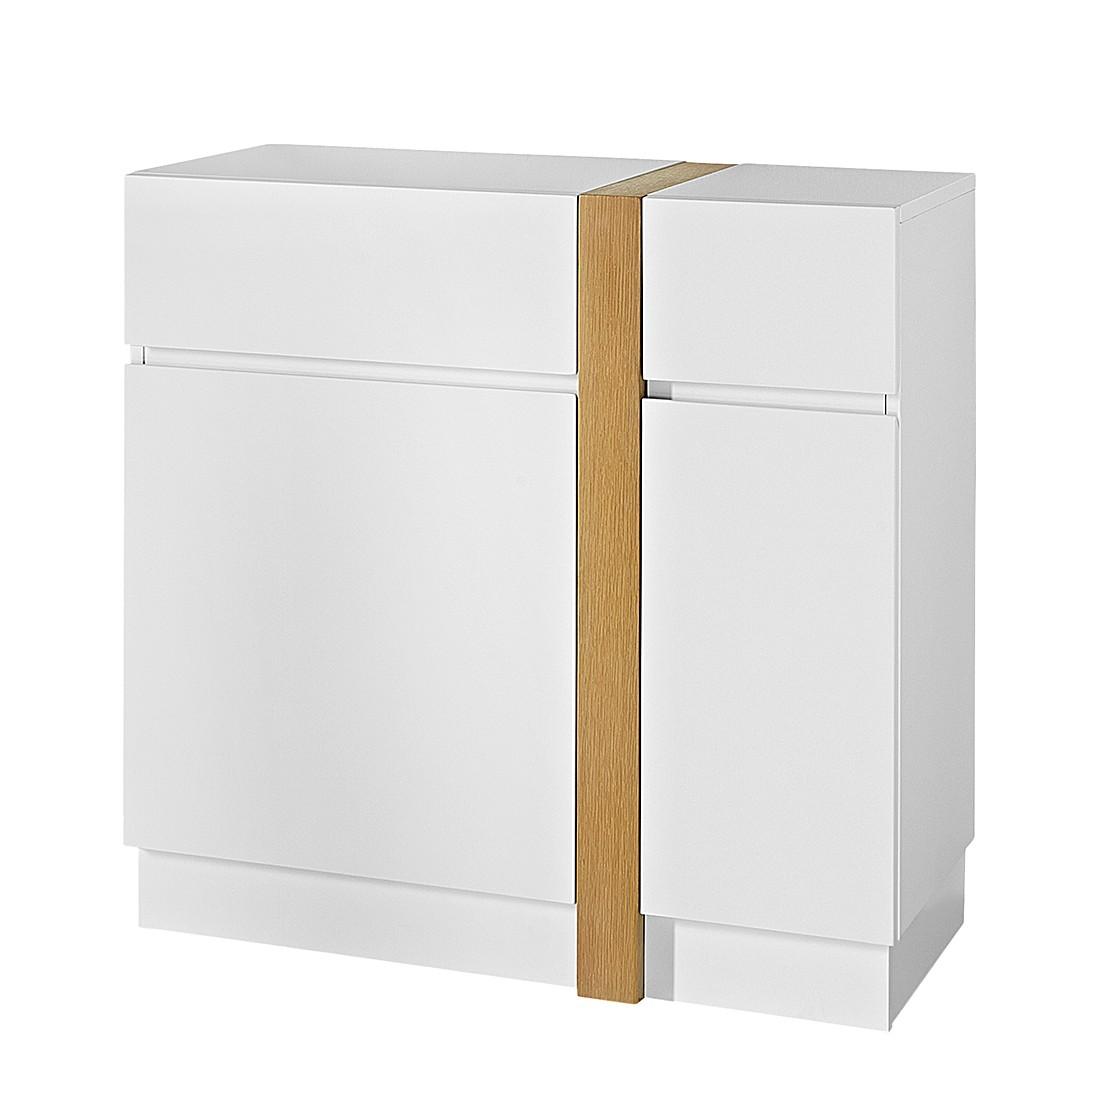 Commode Corredor - Blanc mat / Chêne, loftscape